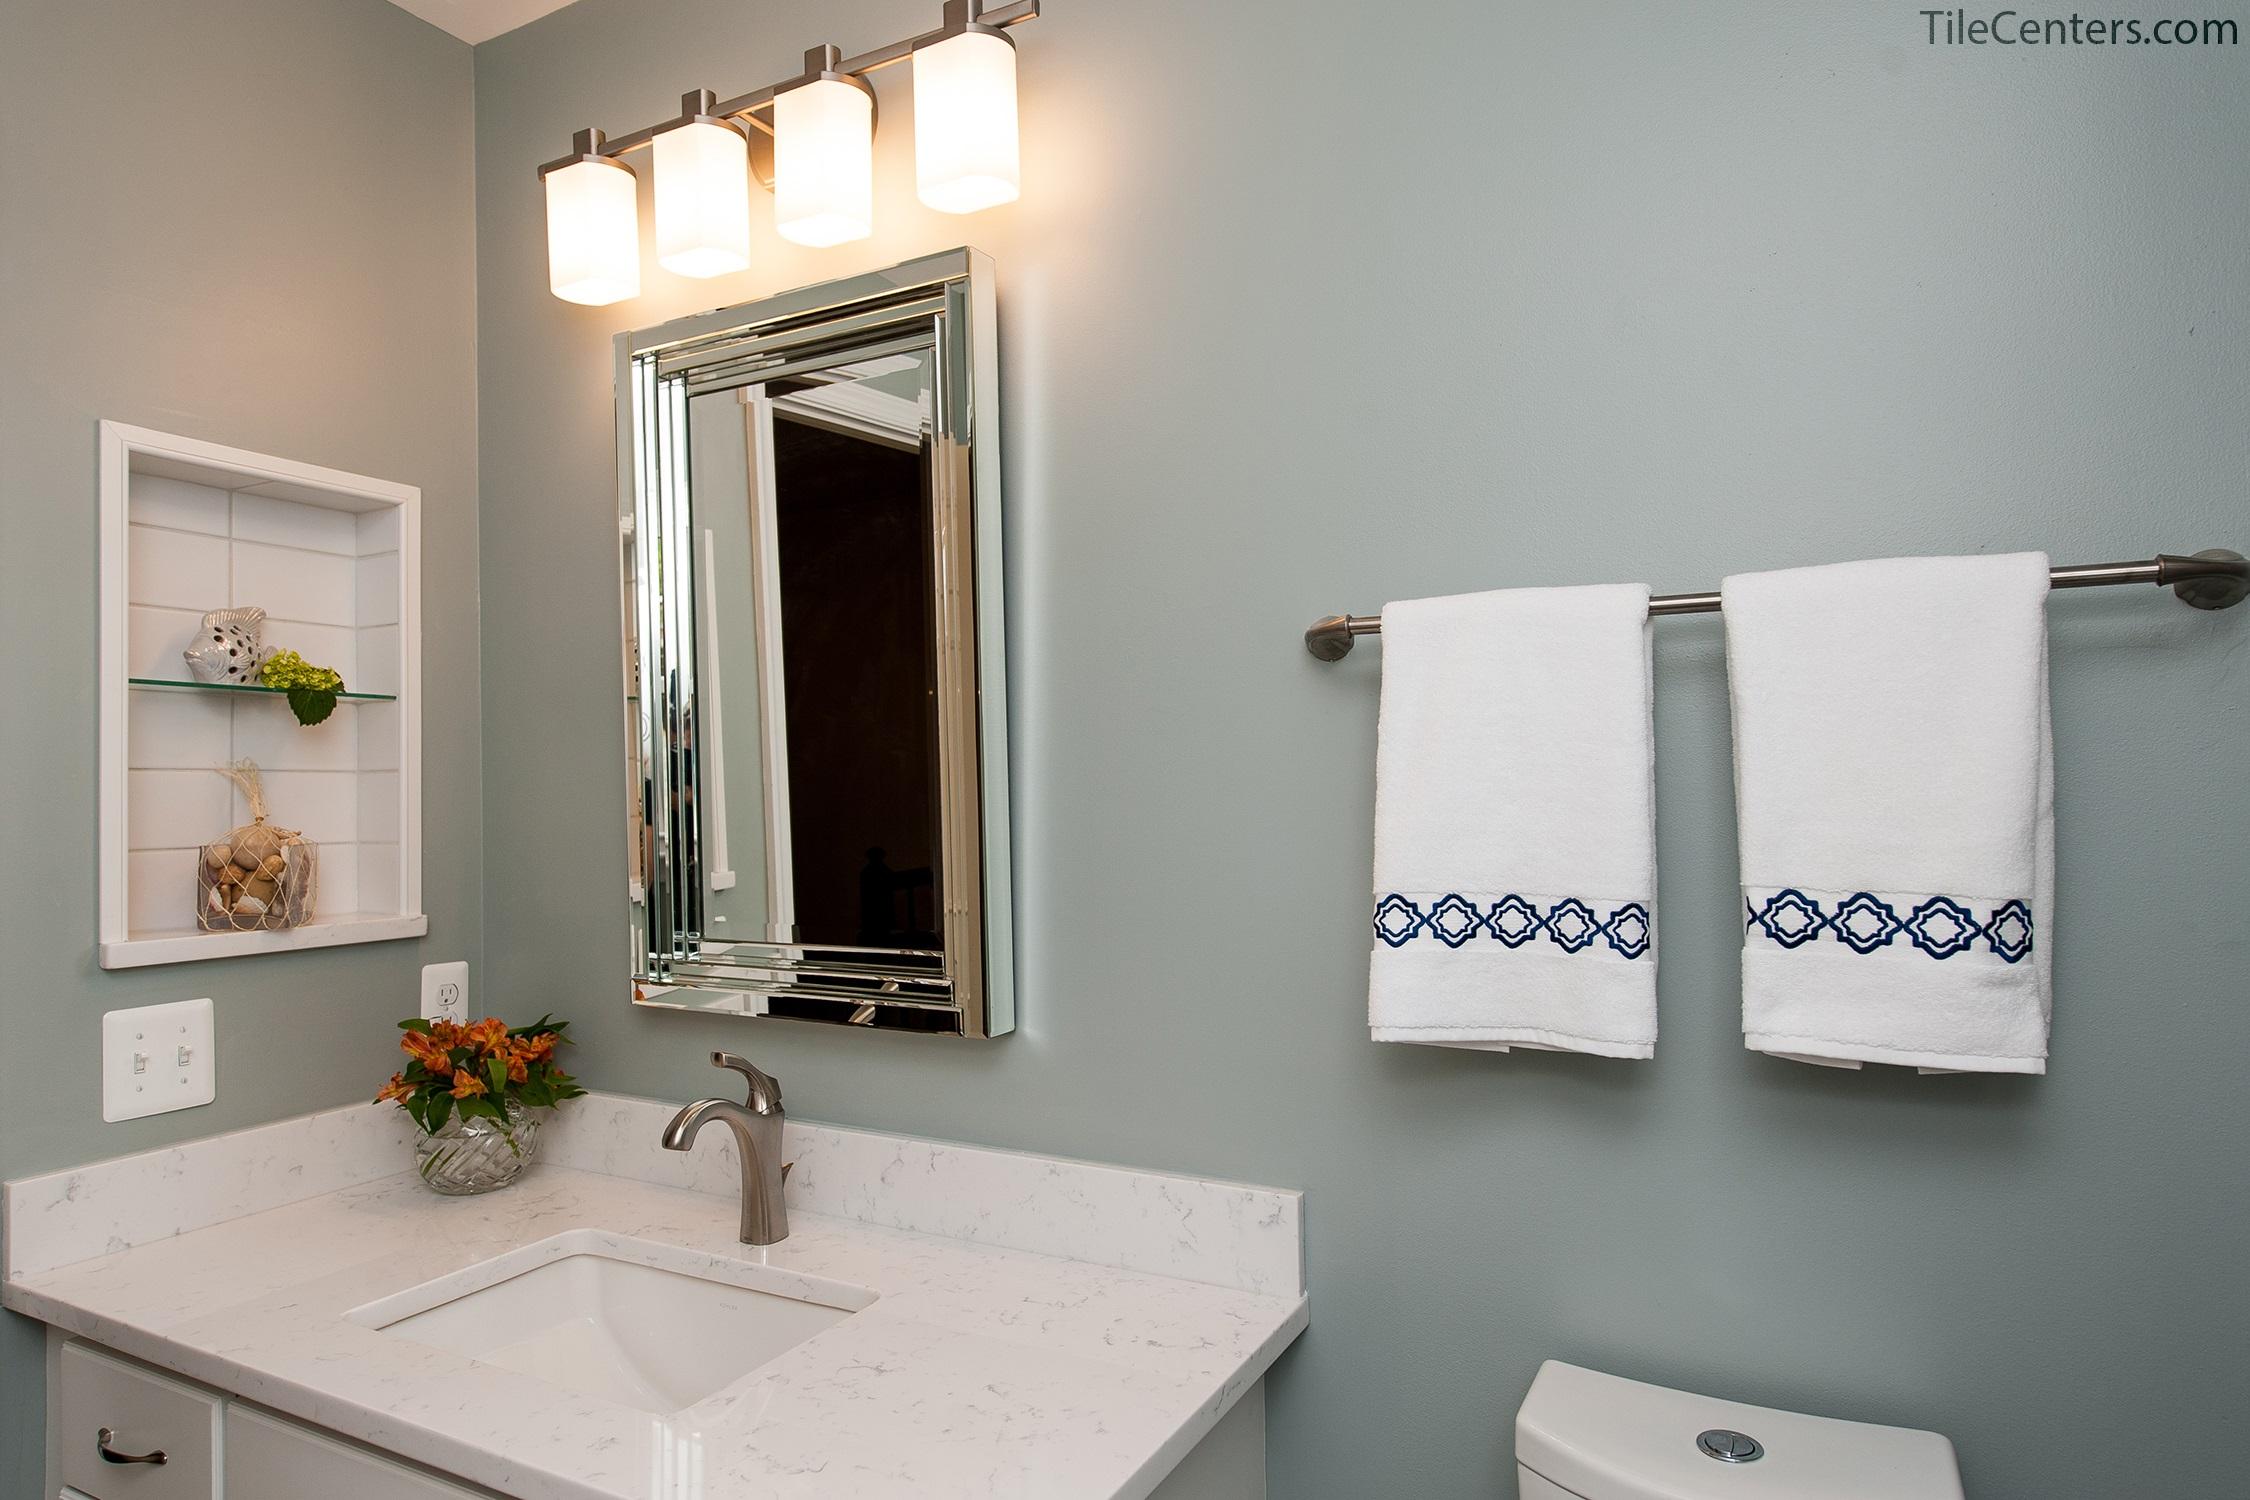 Bathroom Game Preserve Road Gaithersburg MD Tile Center - Bathroom remodeling montgomery county md